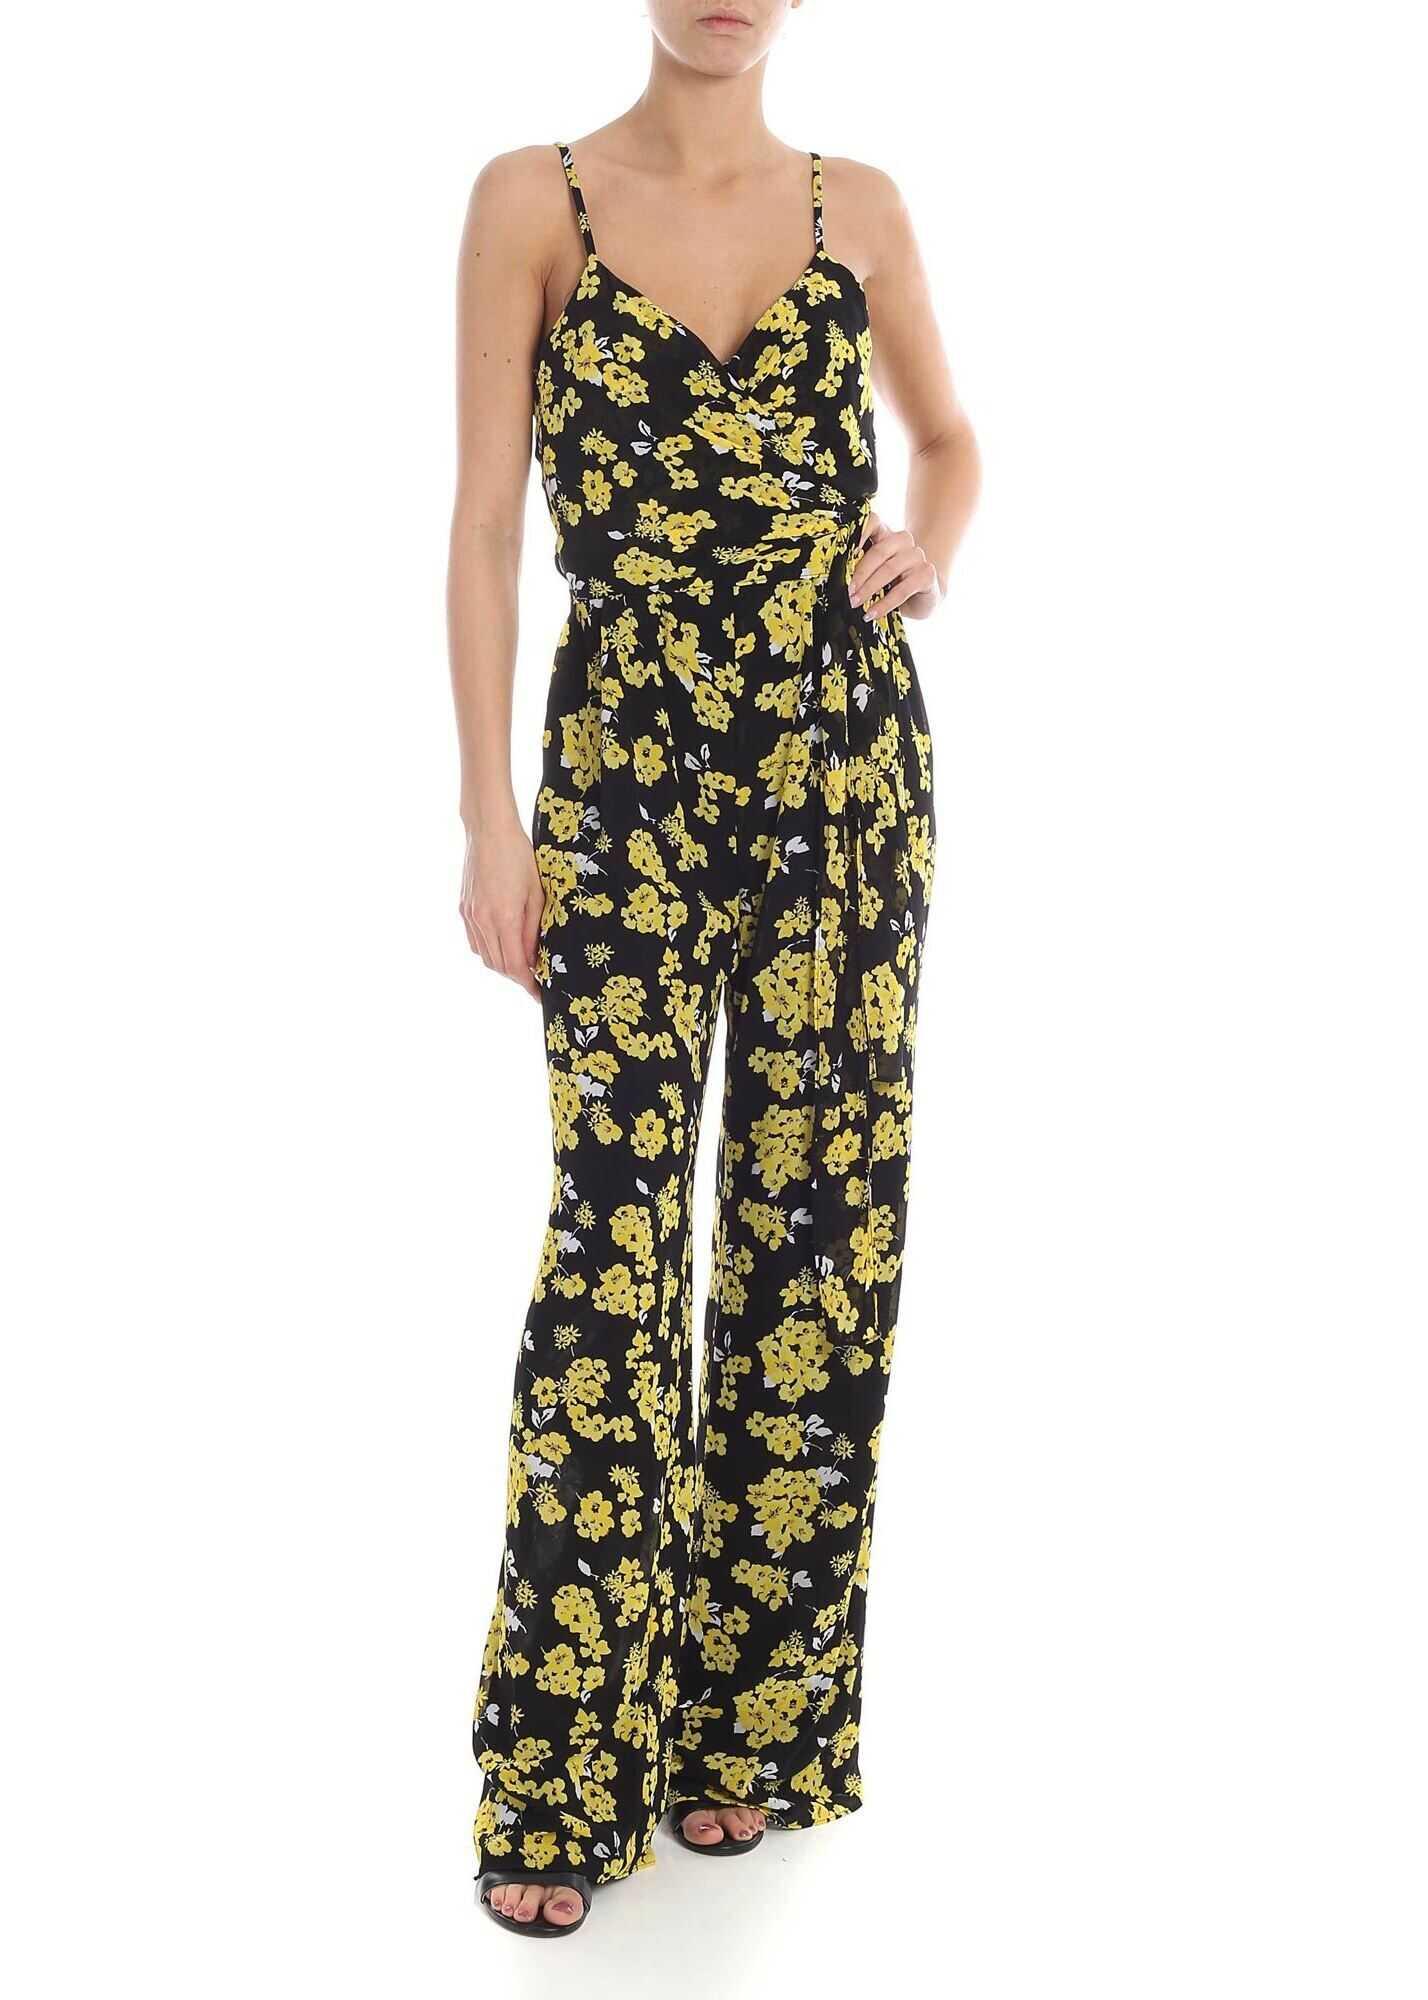 Michael Kors Black Jumpsuit With Flower Print Multi